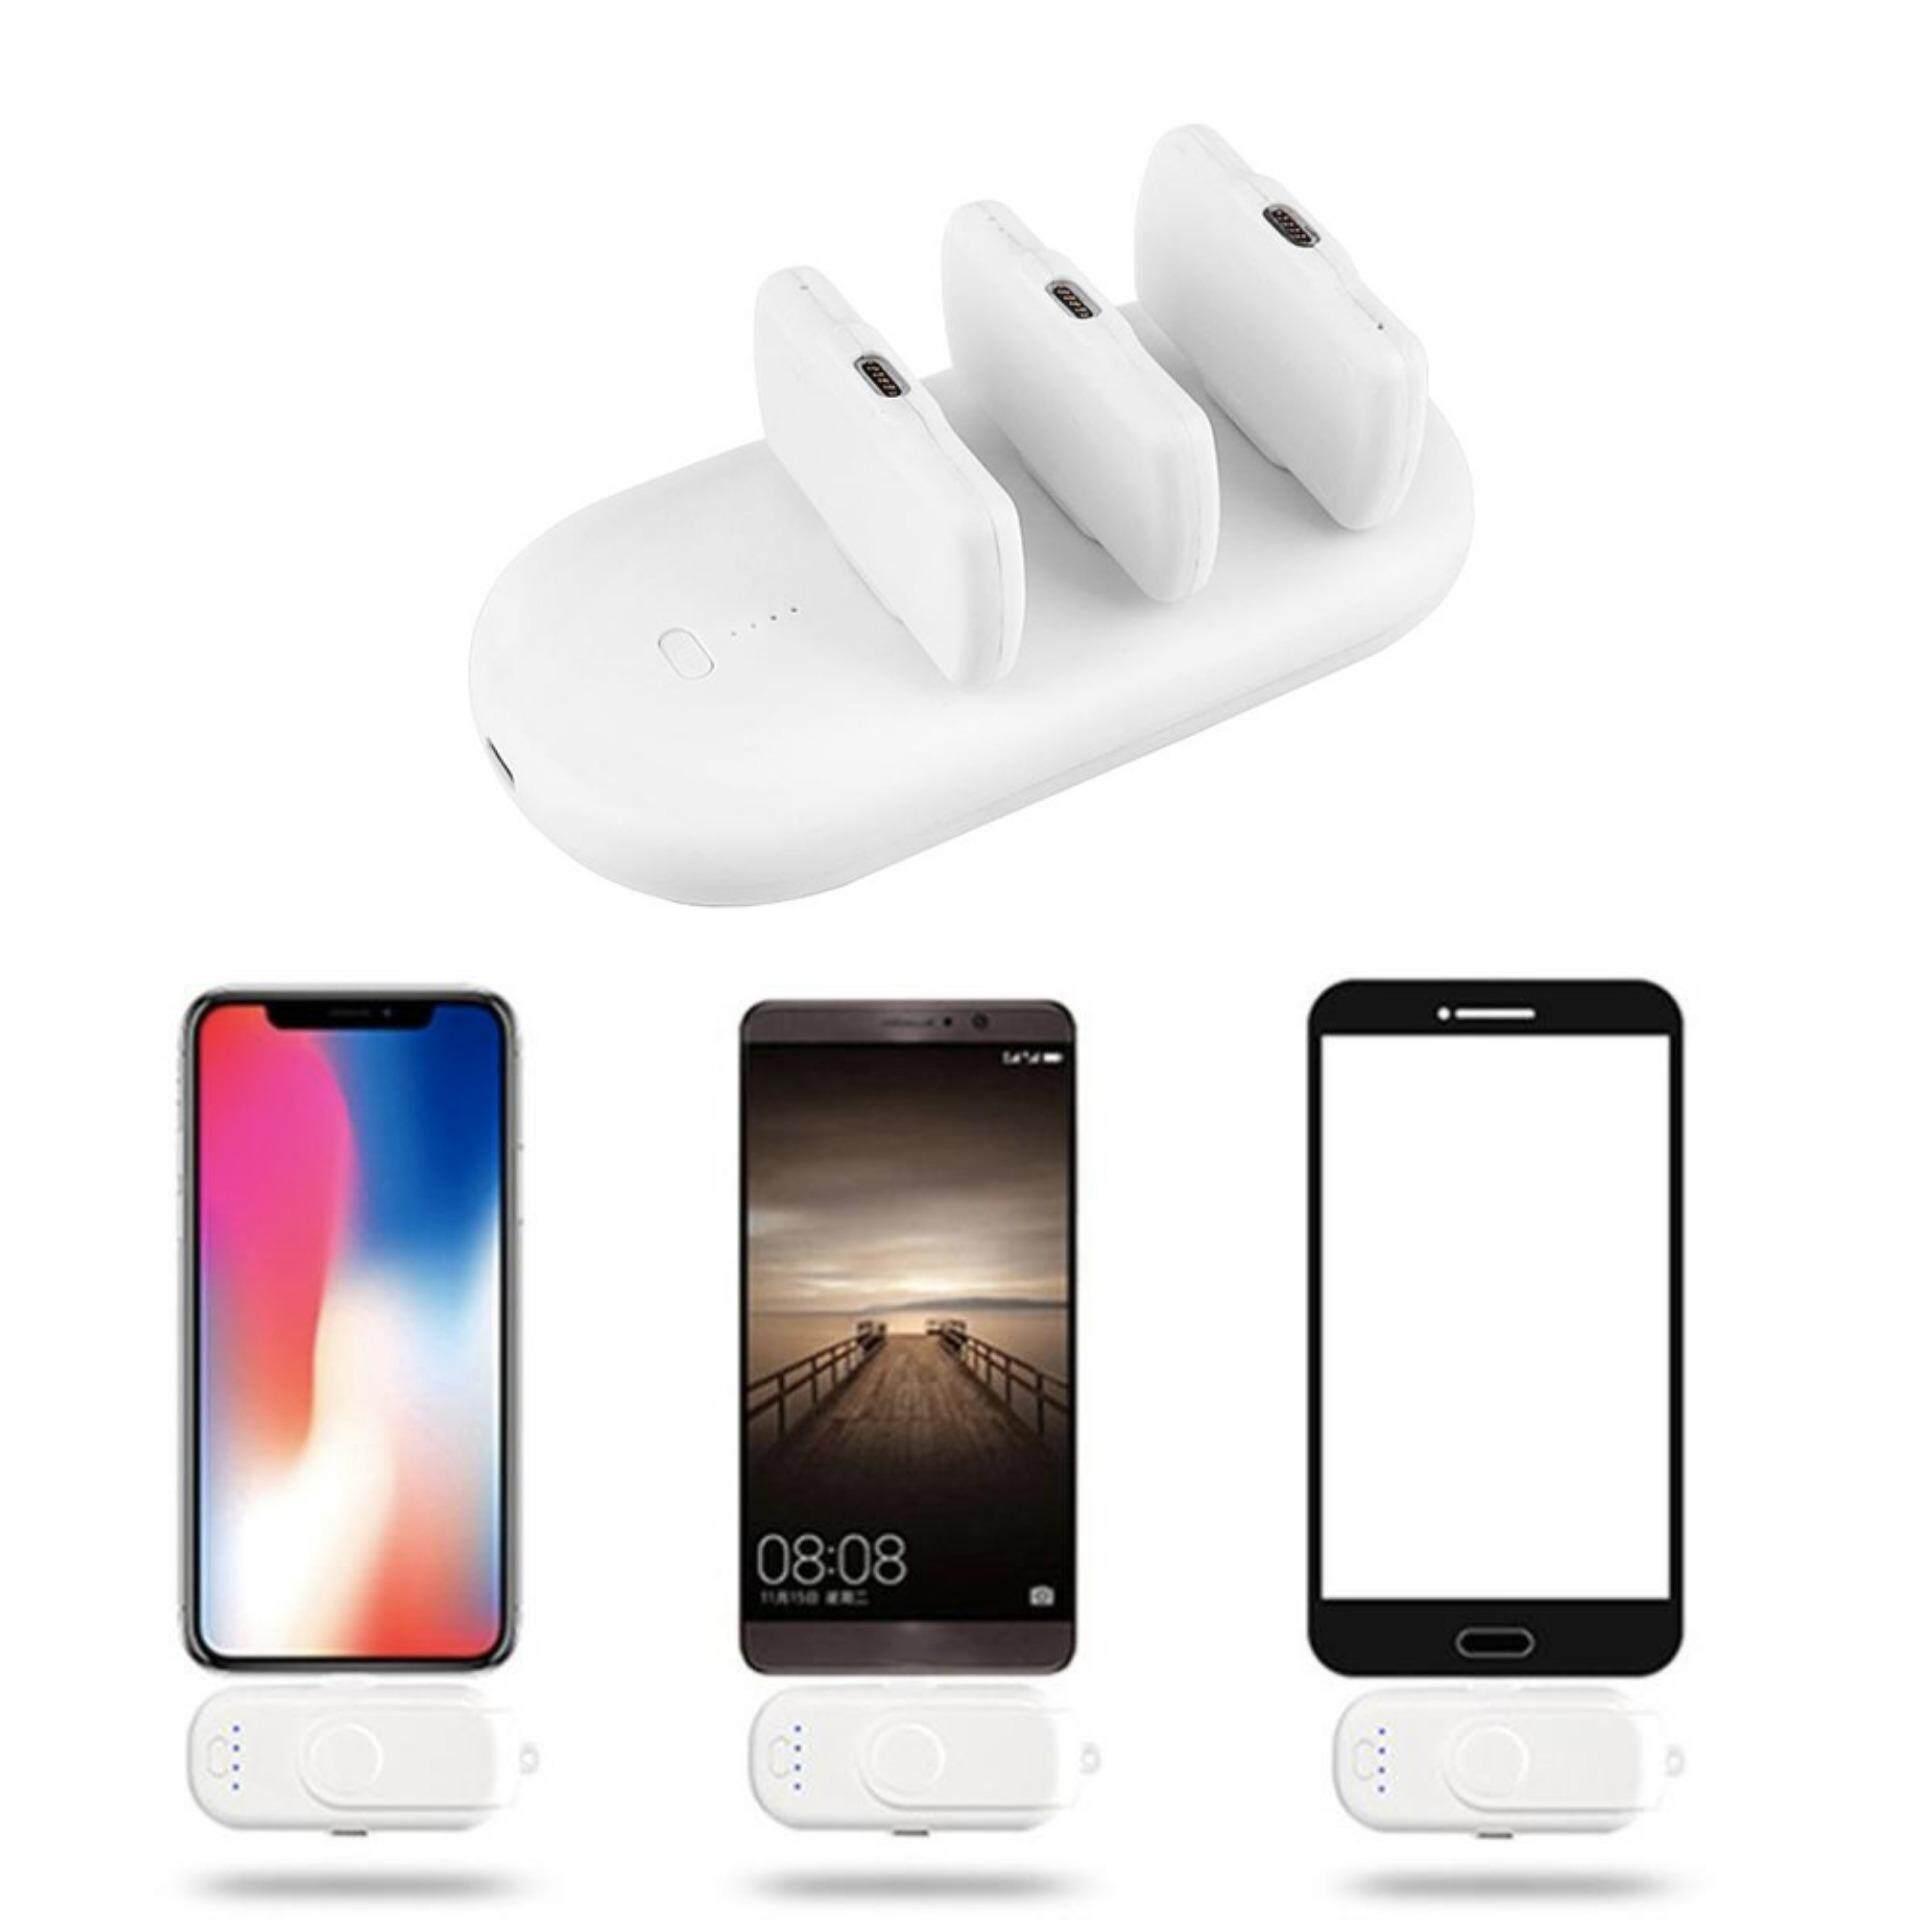 [GILERR PROMOTION] Magnetic Power Bank 5000mAh + 950mAh x 3 For IPhone/Micro/Type-C